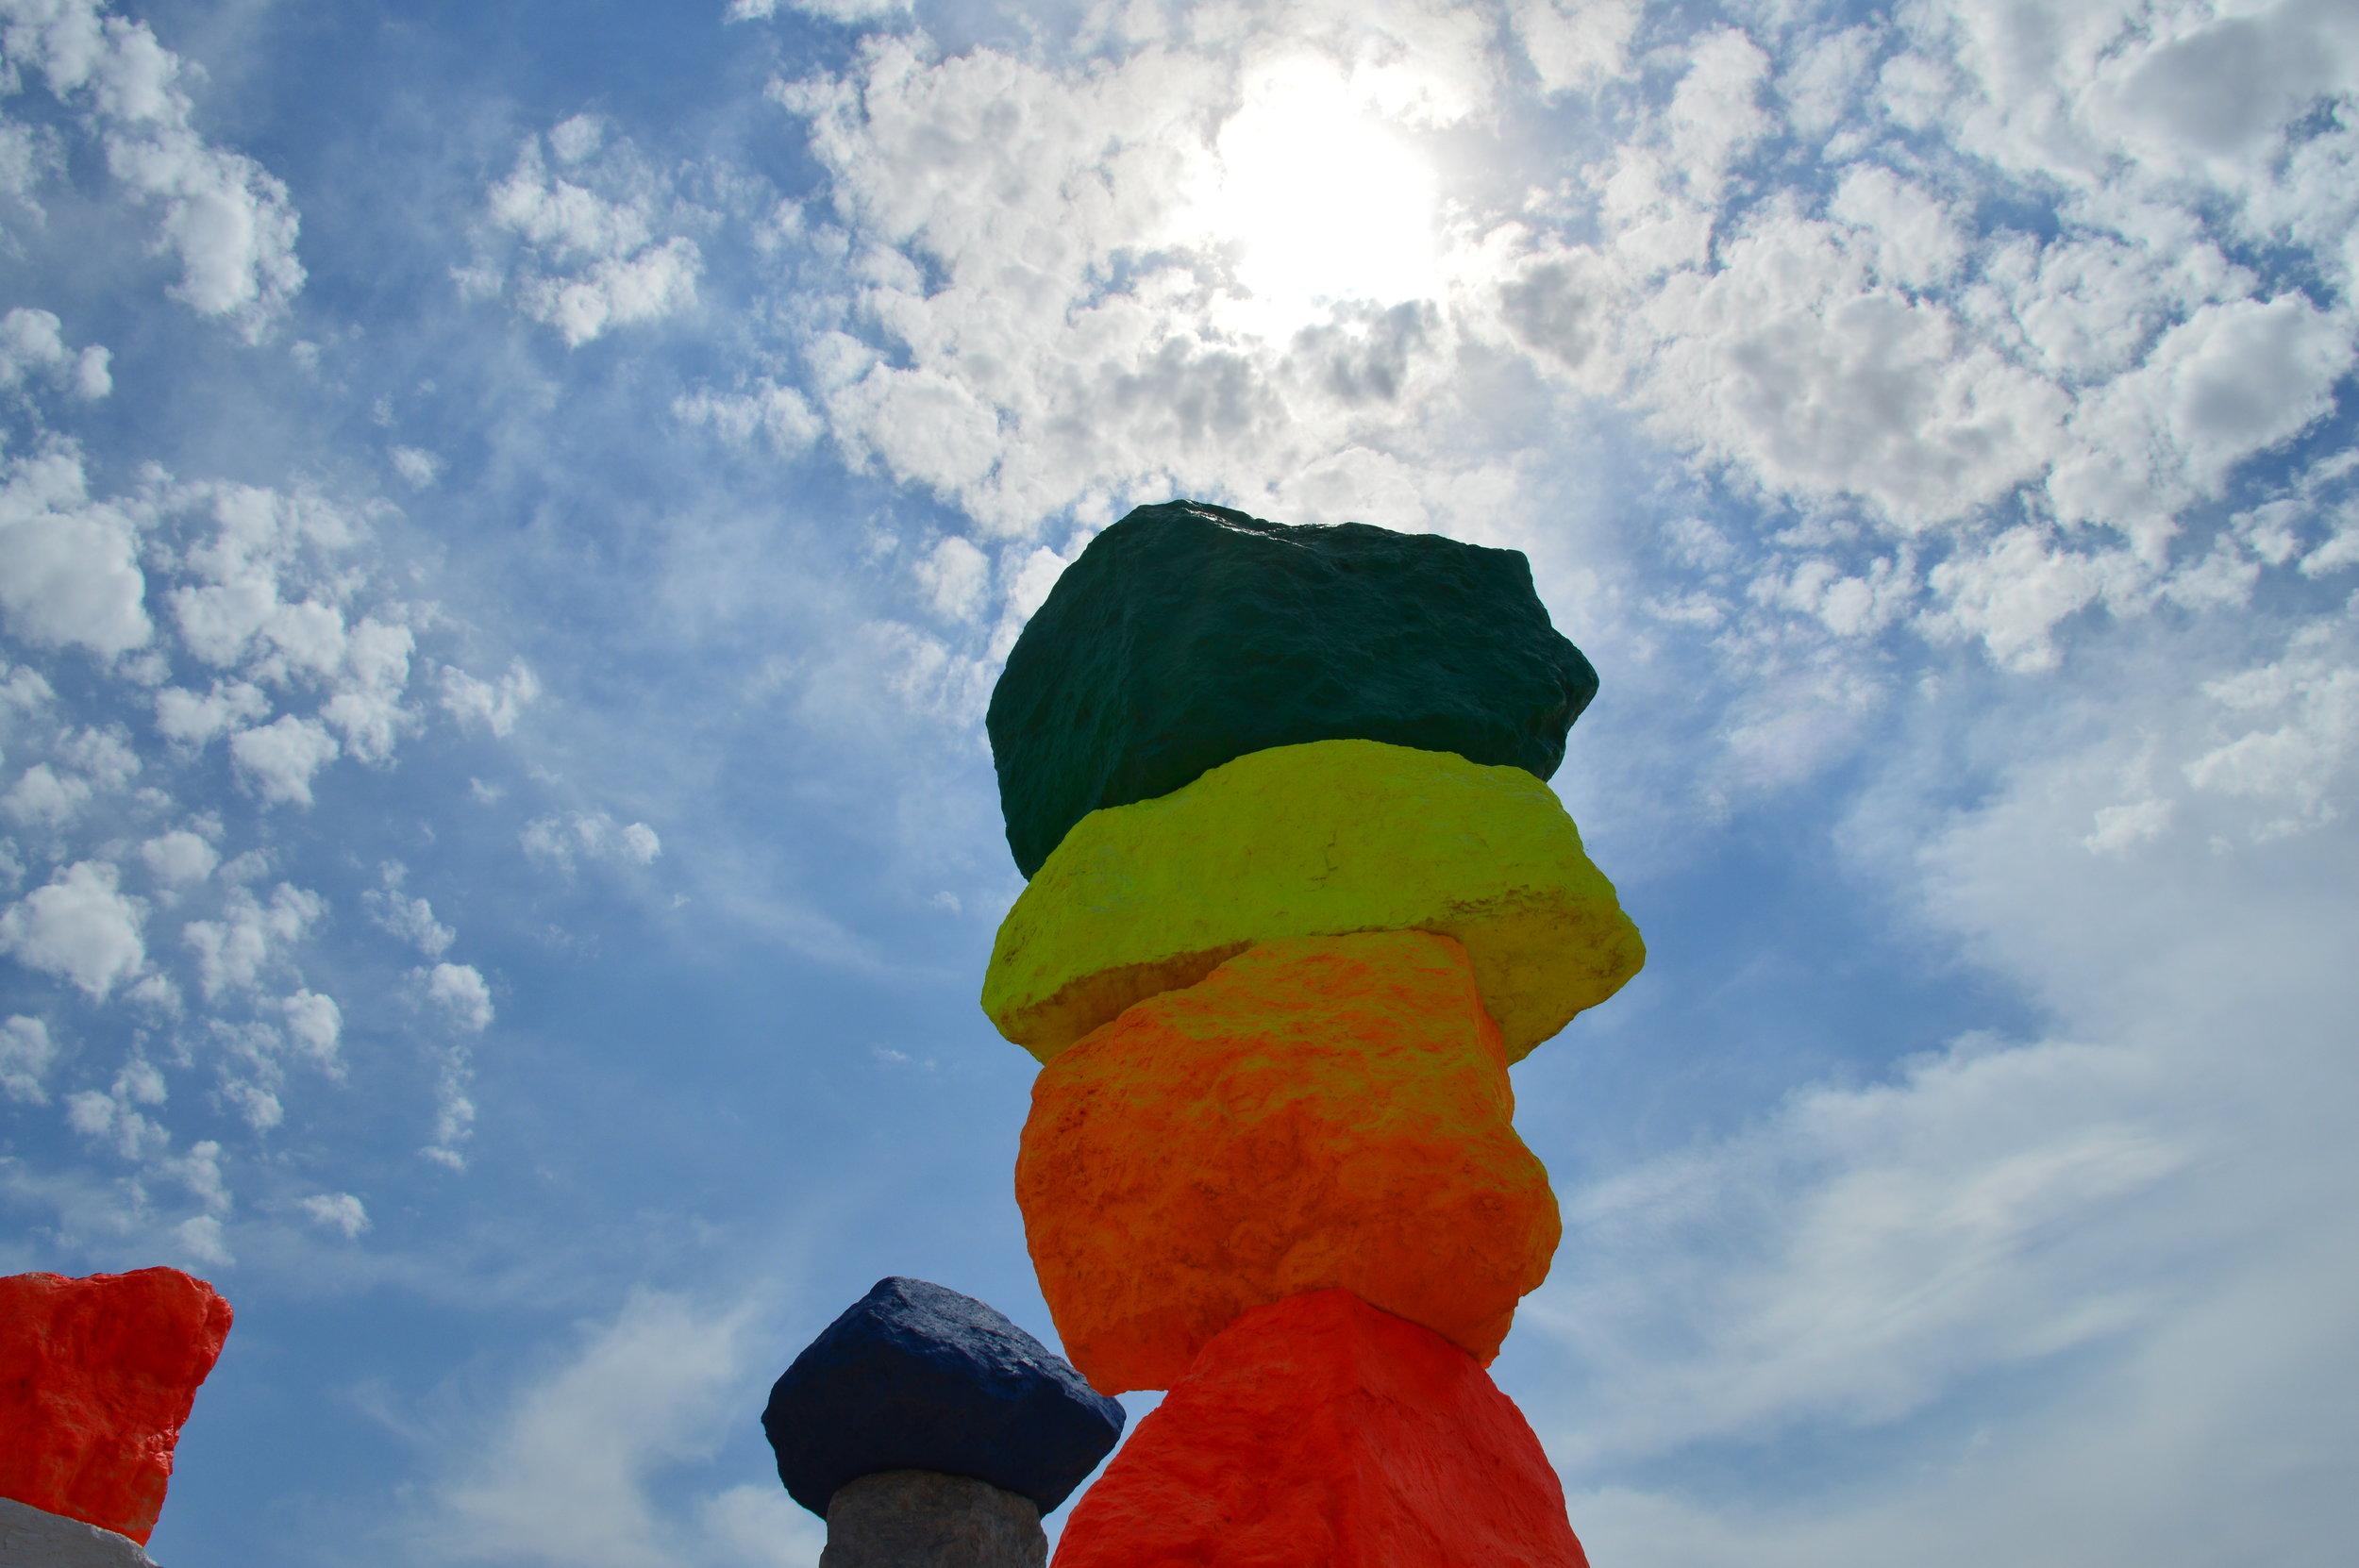 VEGASMAMAS'™ ode to NANCY HOLT'S Land Art Installation  SUN TUNNELS in Lucin, TX